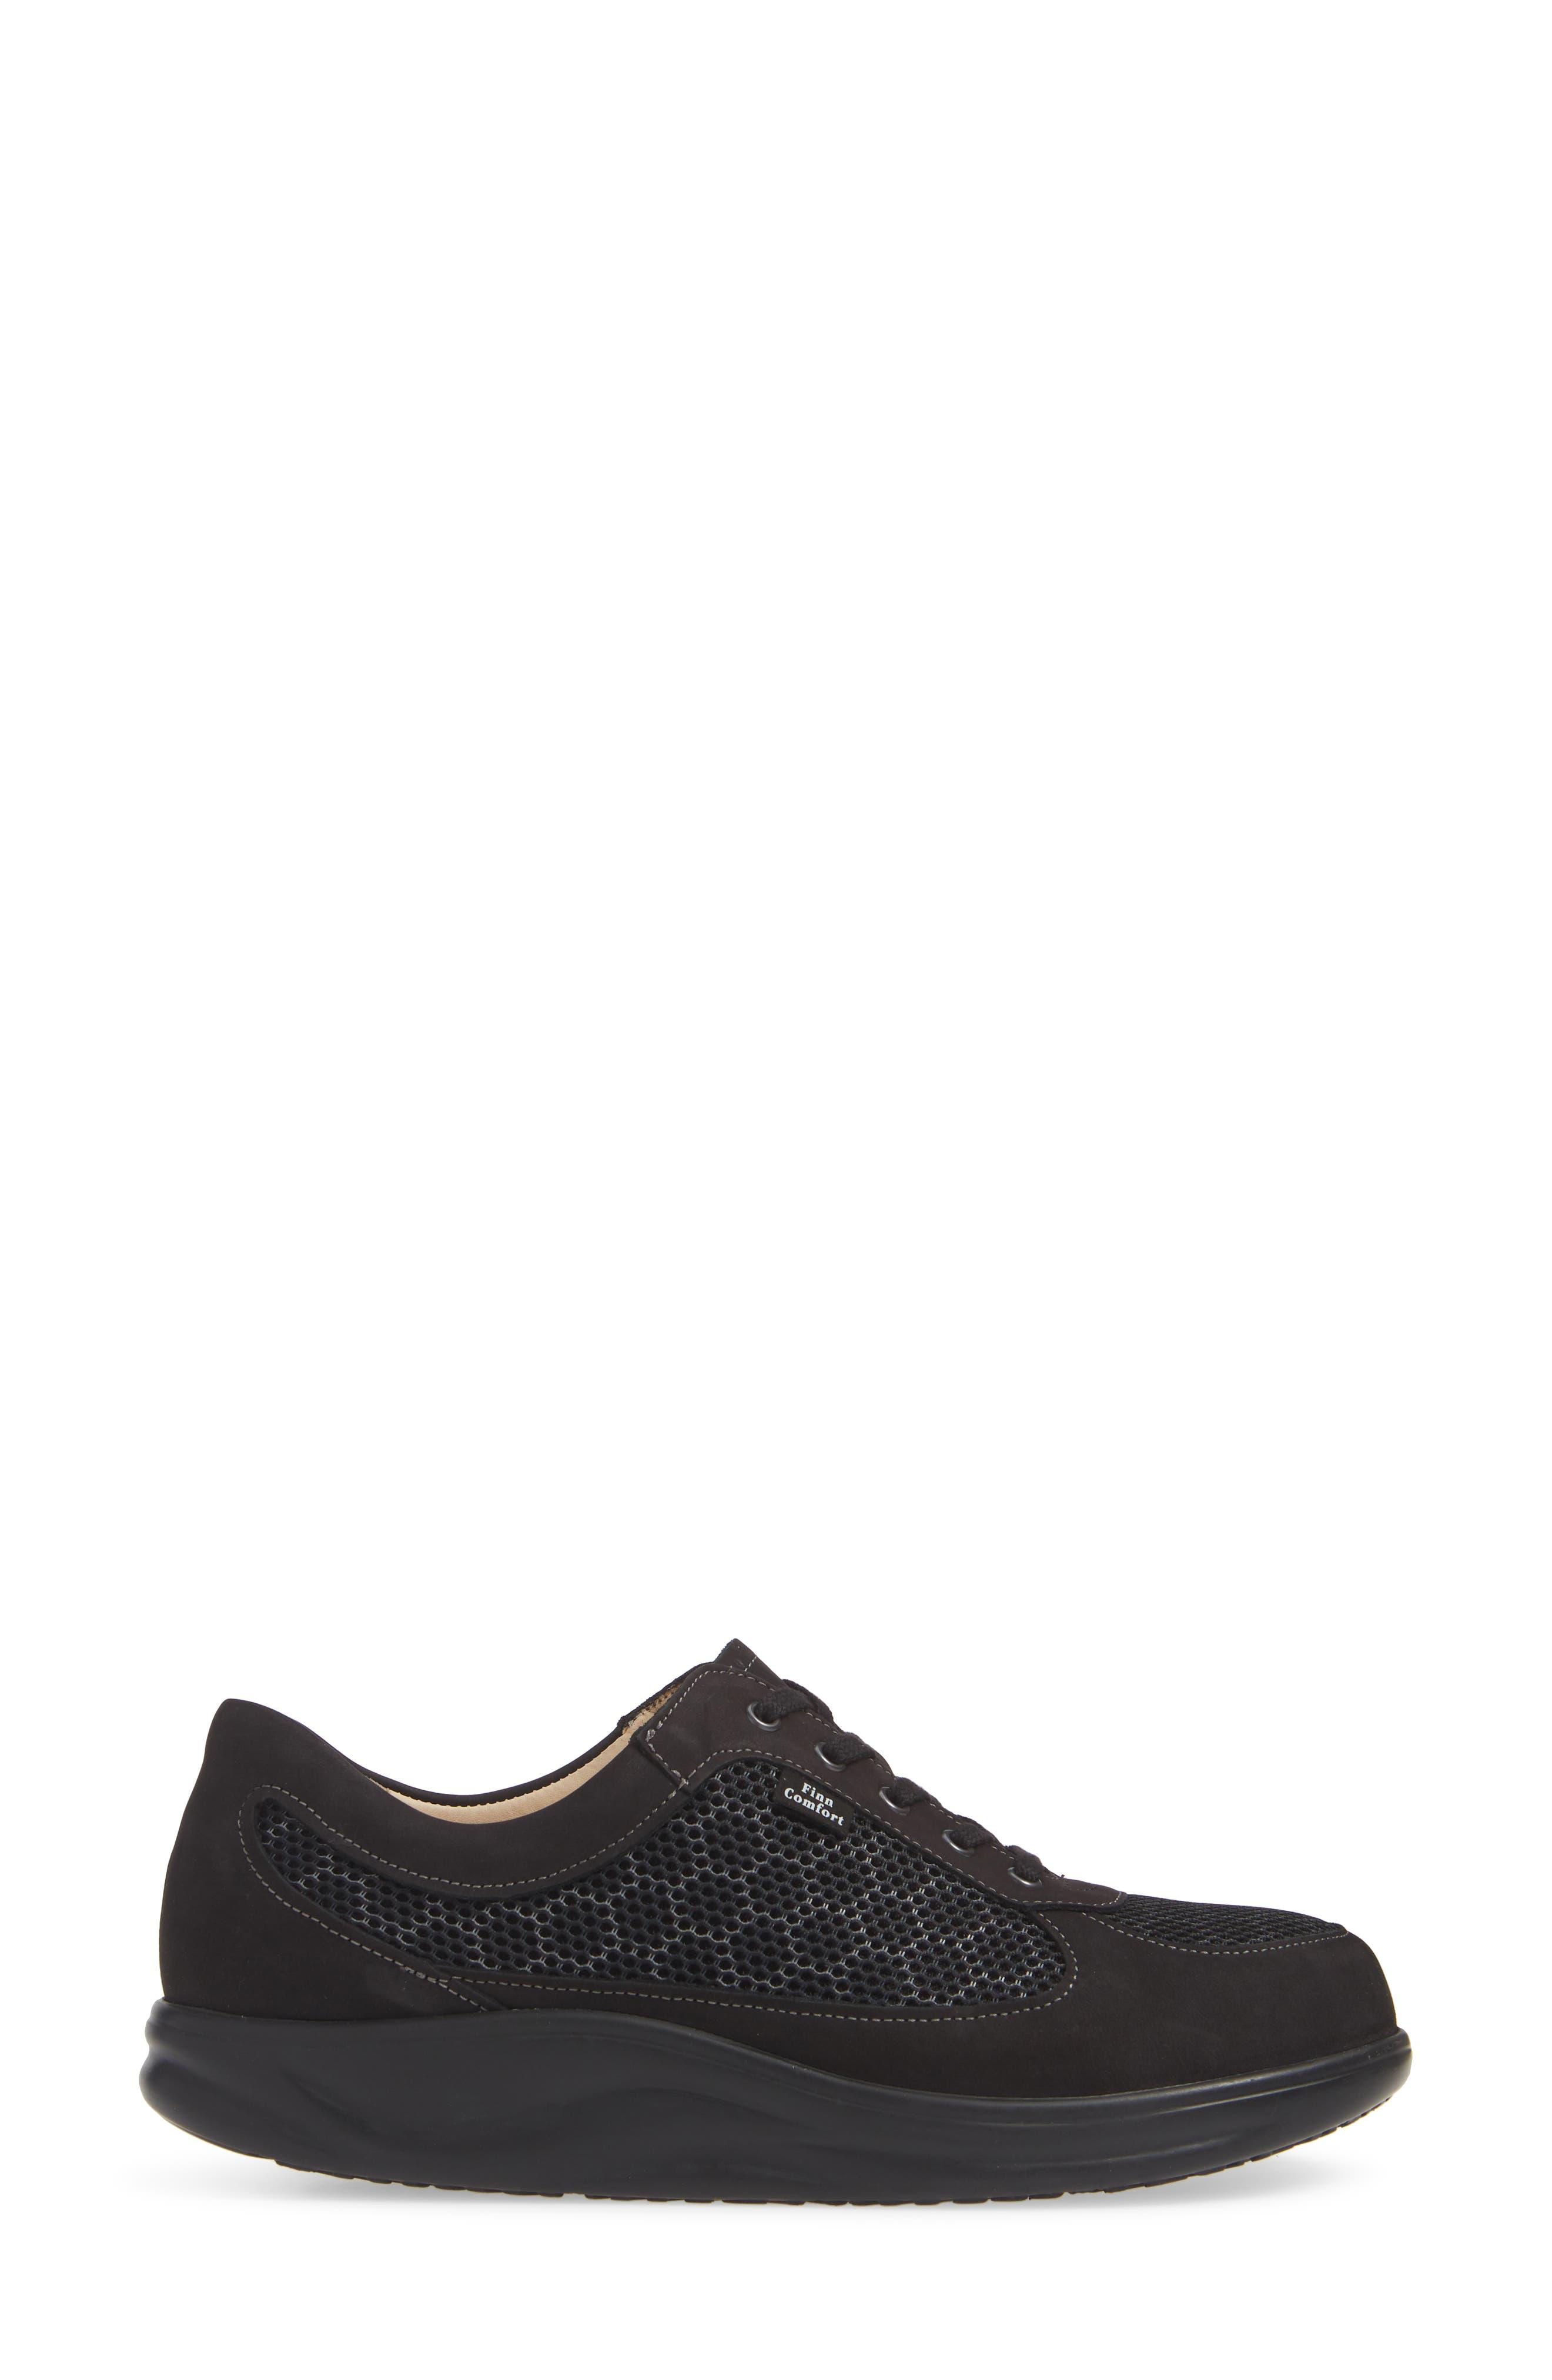 'Columbia' Sneaker,                             Alternate thumbnail 3, color,                             BLACK NUBUCK LEATHER